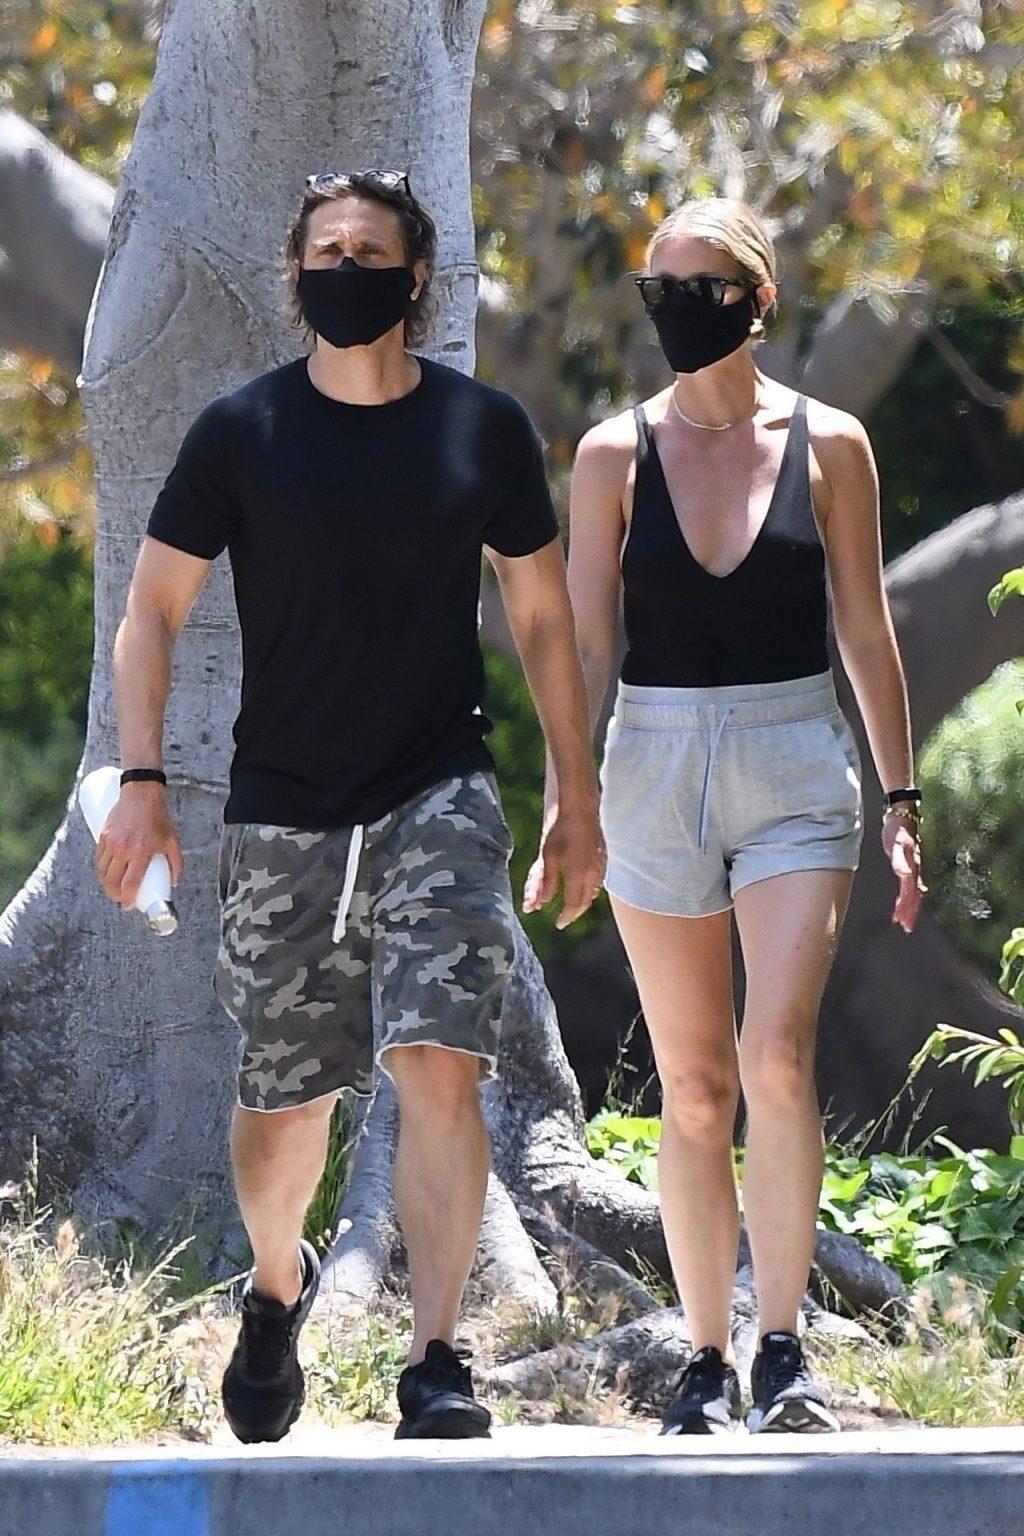 Gwyneth Paltrow & Brad Falchuk Go Out For an Afternoon Stroll (22 Photos)